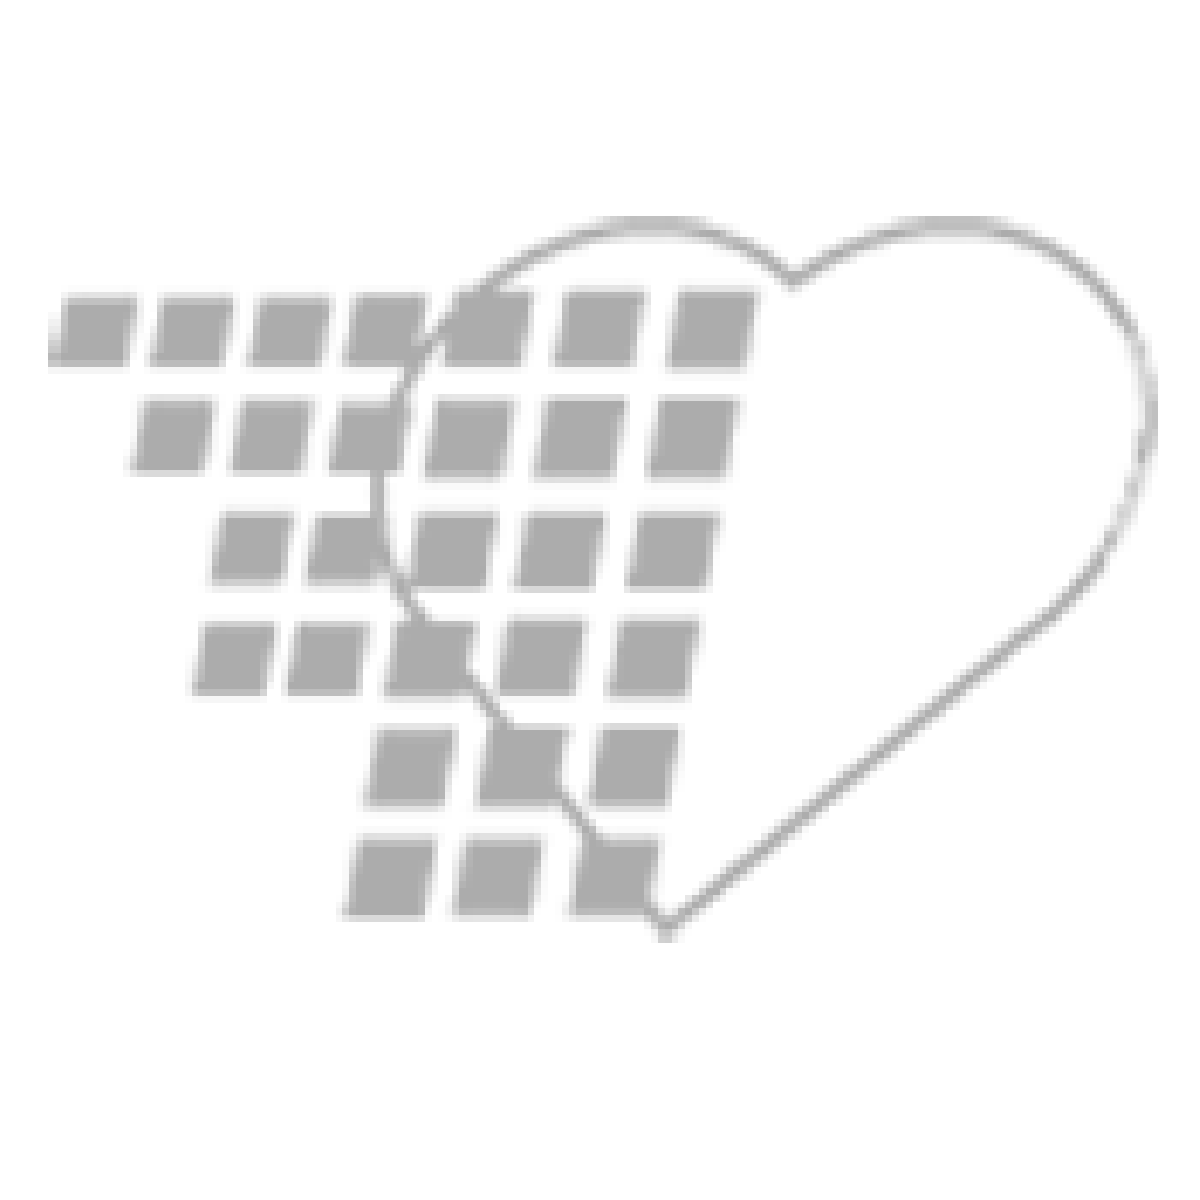 06-93-0067 - Demo Dose® Amoxicilln 250 mg - 1000 Pills/Jar